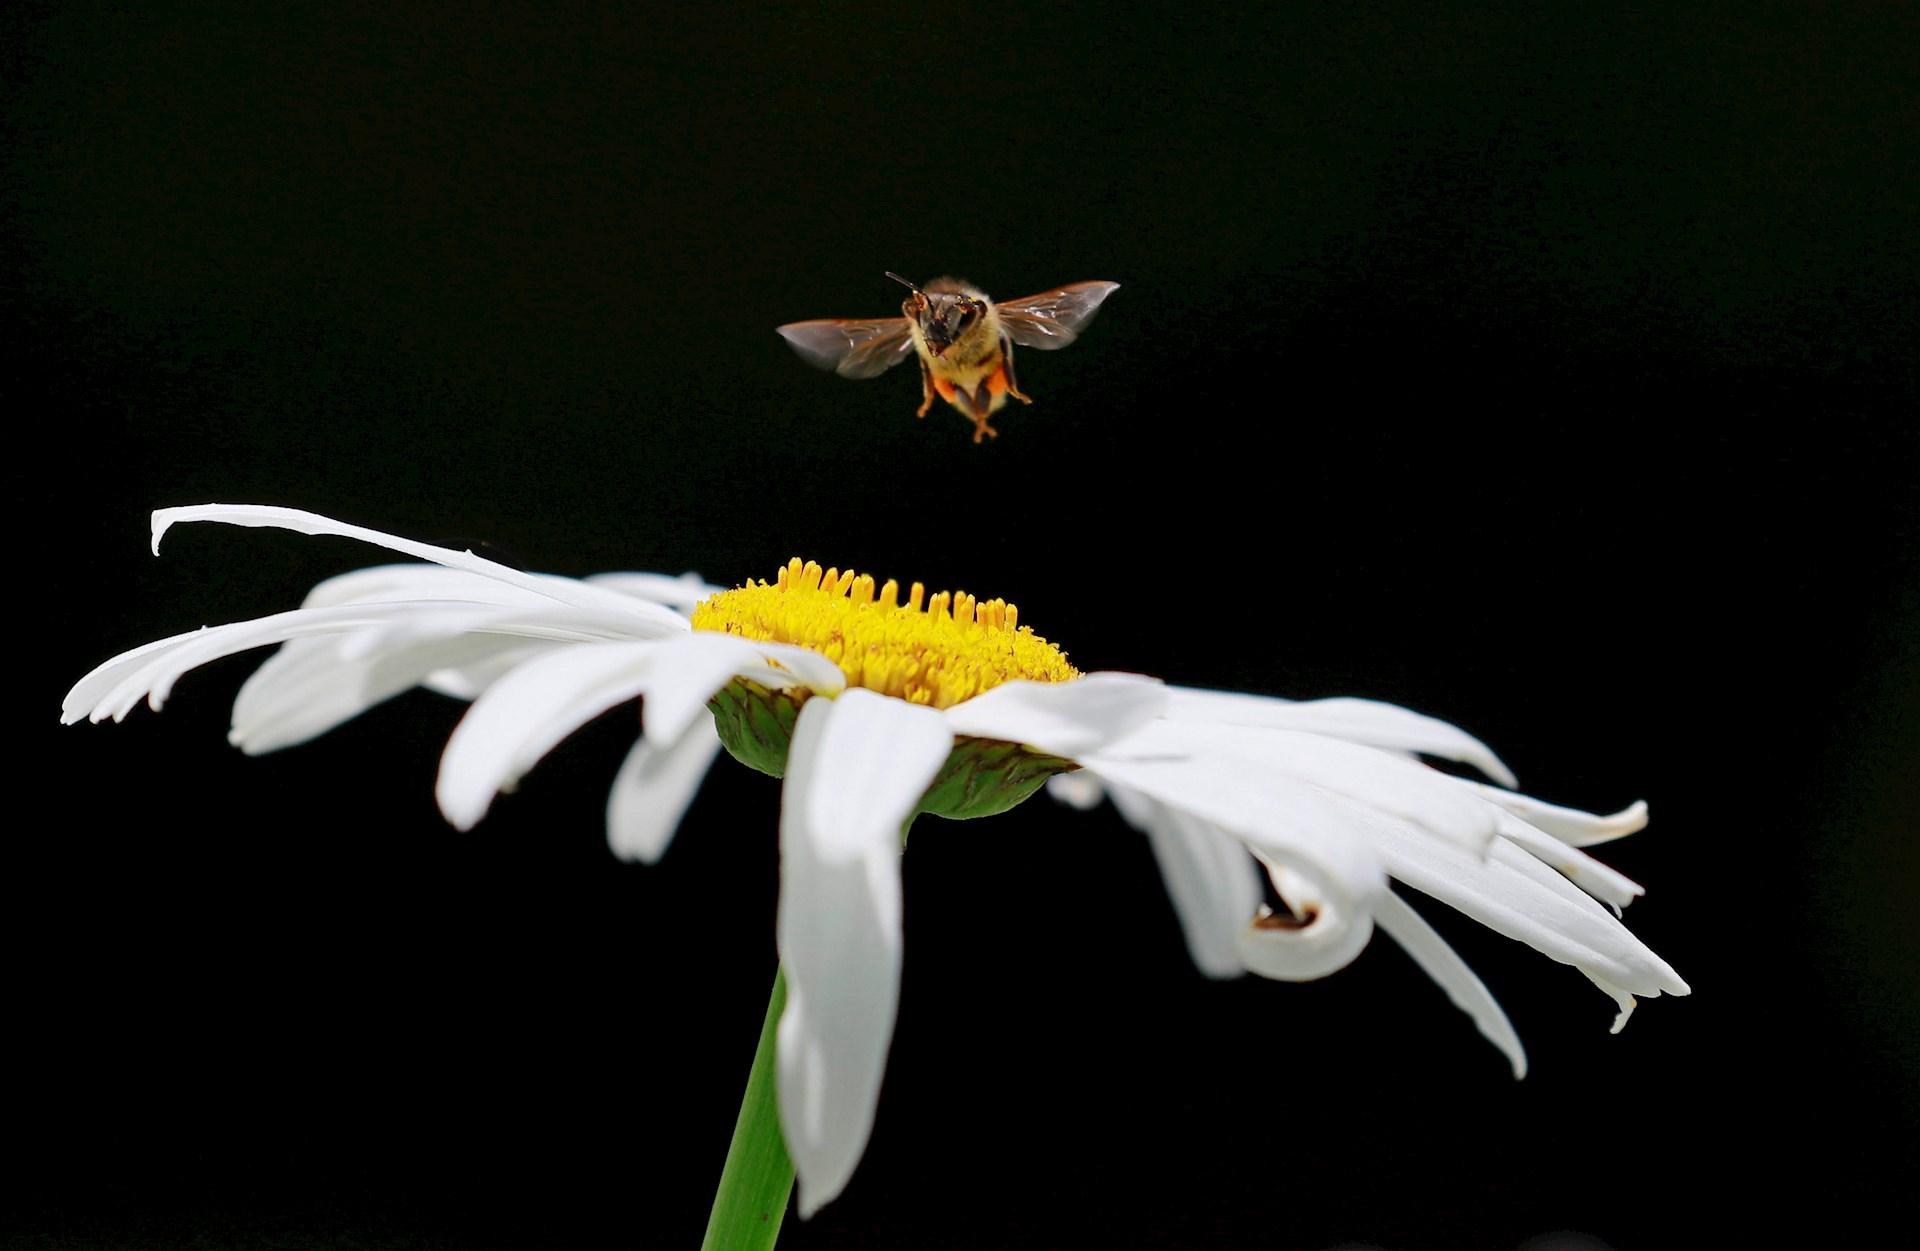 Abejas polinizan flores